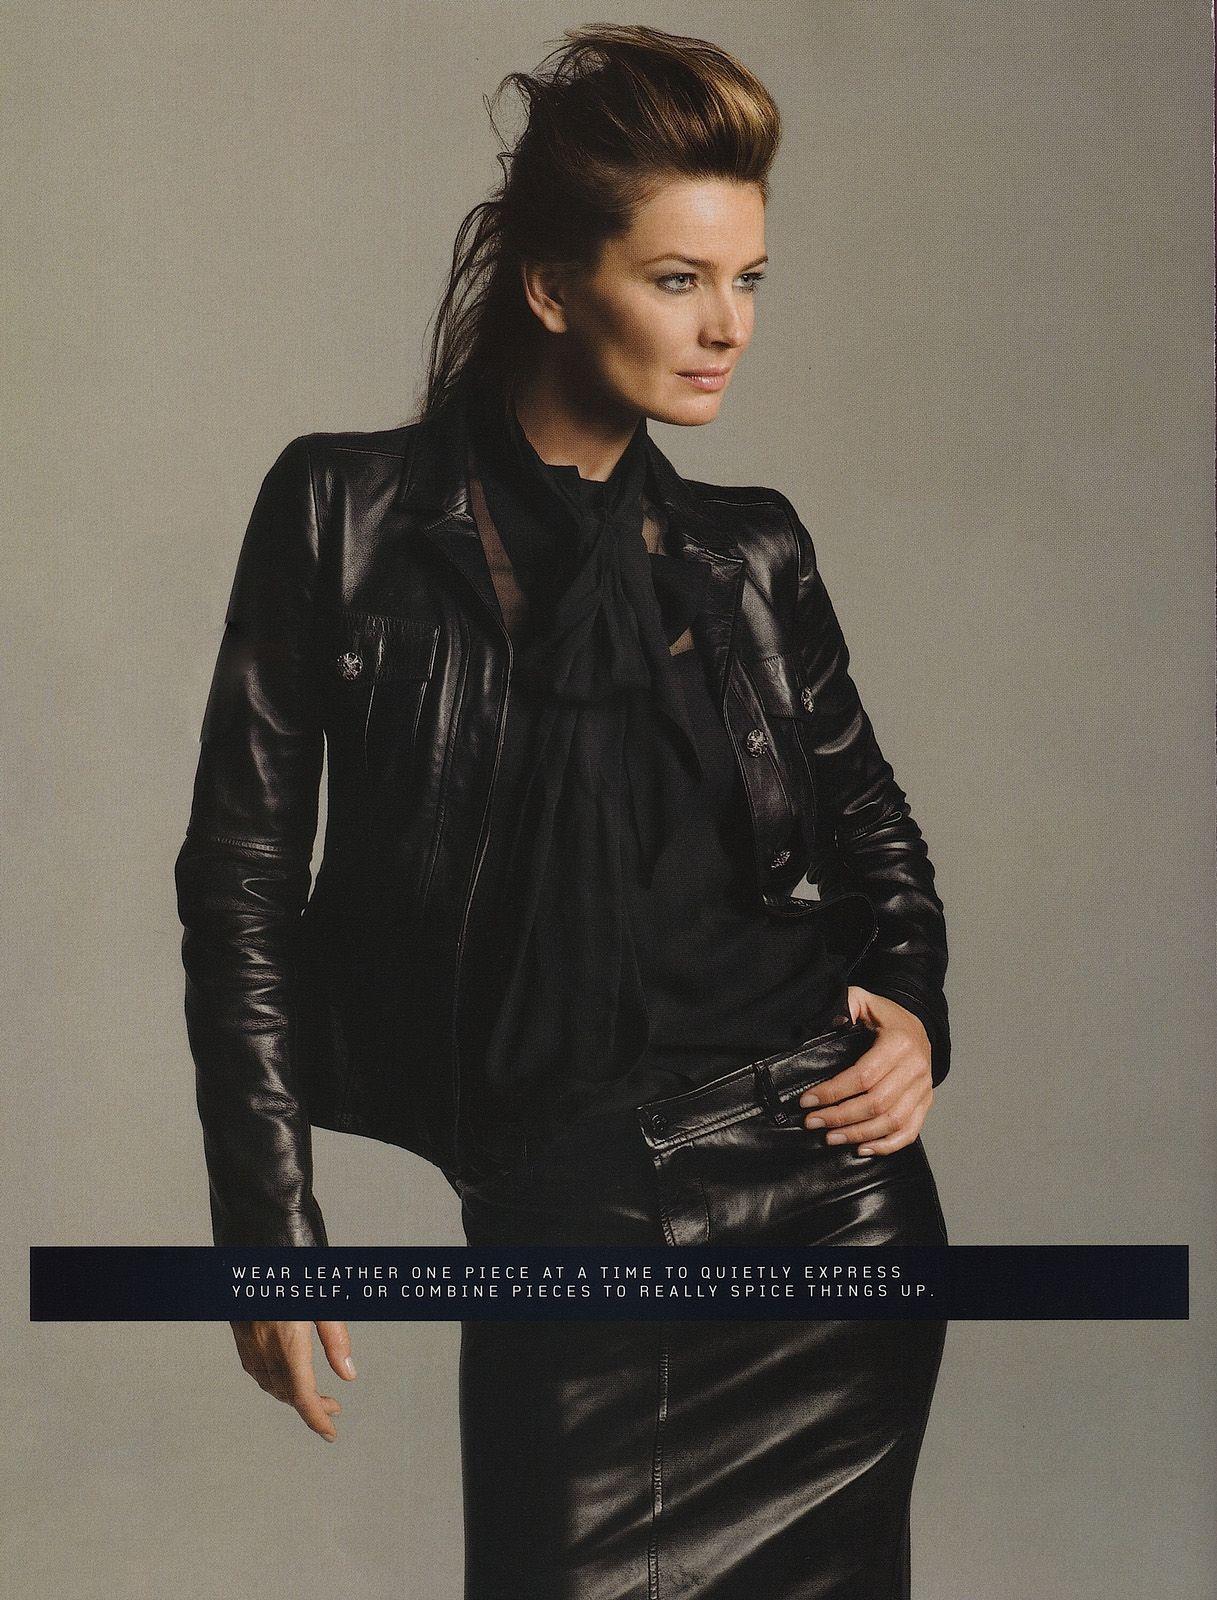 Paulina Porizkova in Chanel leather jacket and Ralph Lauren leather skirt